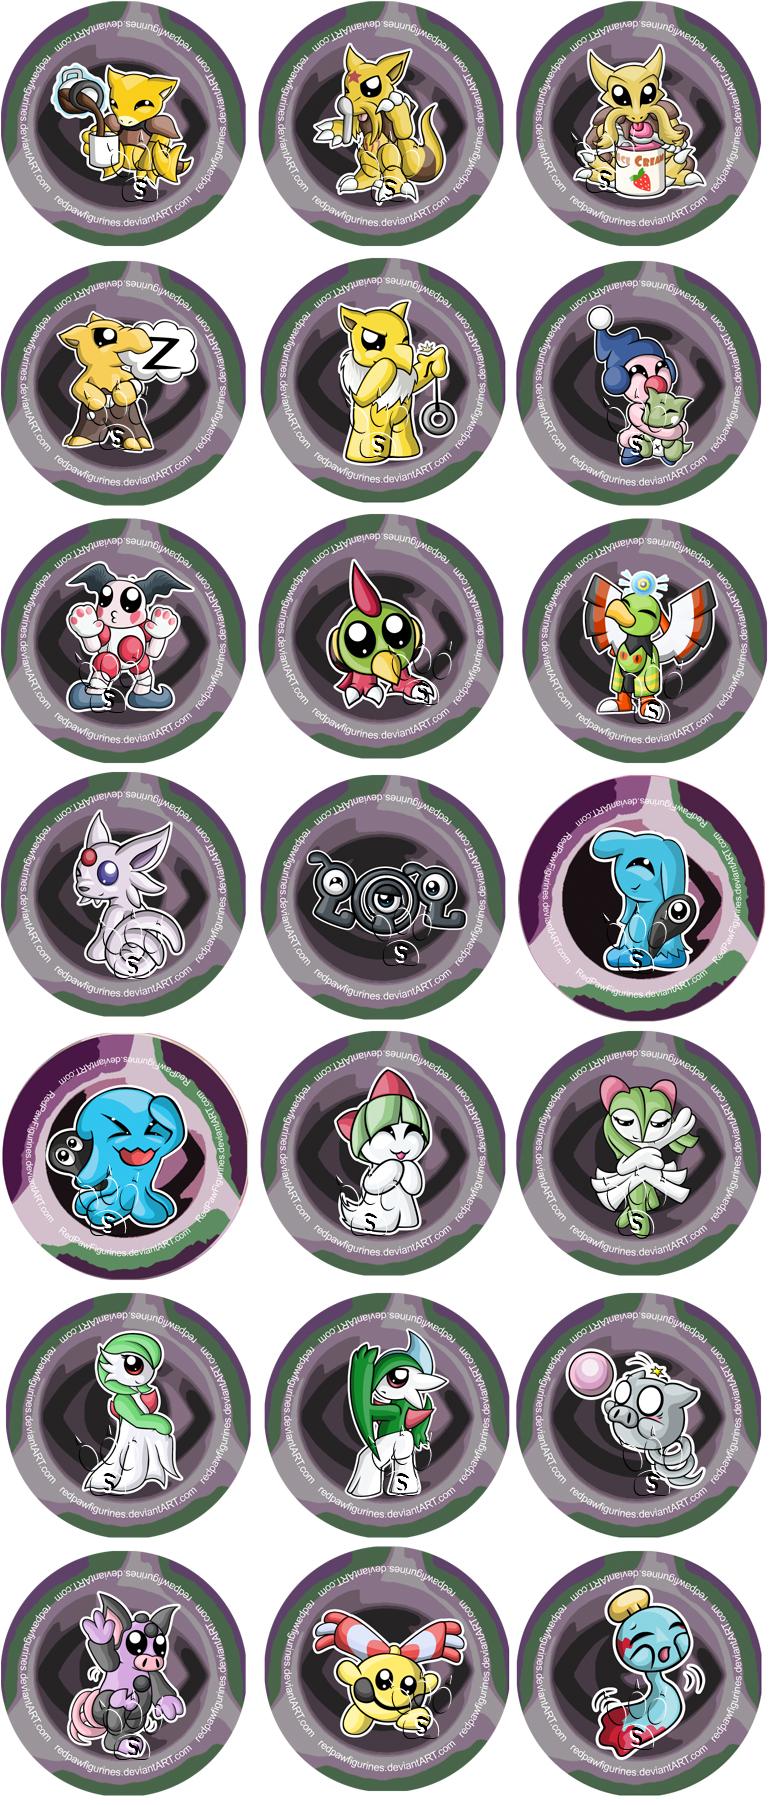 psychic type pokemon chibi badges by redpawdesigns on